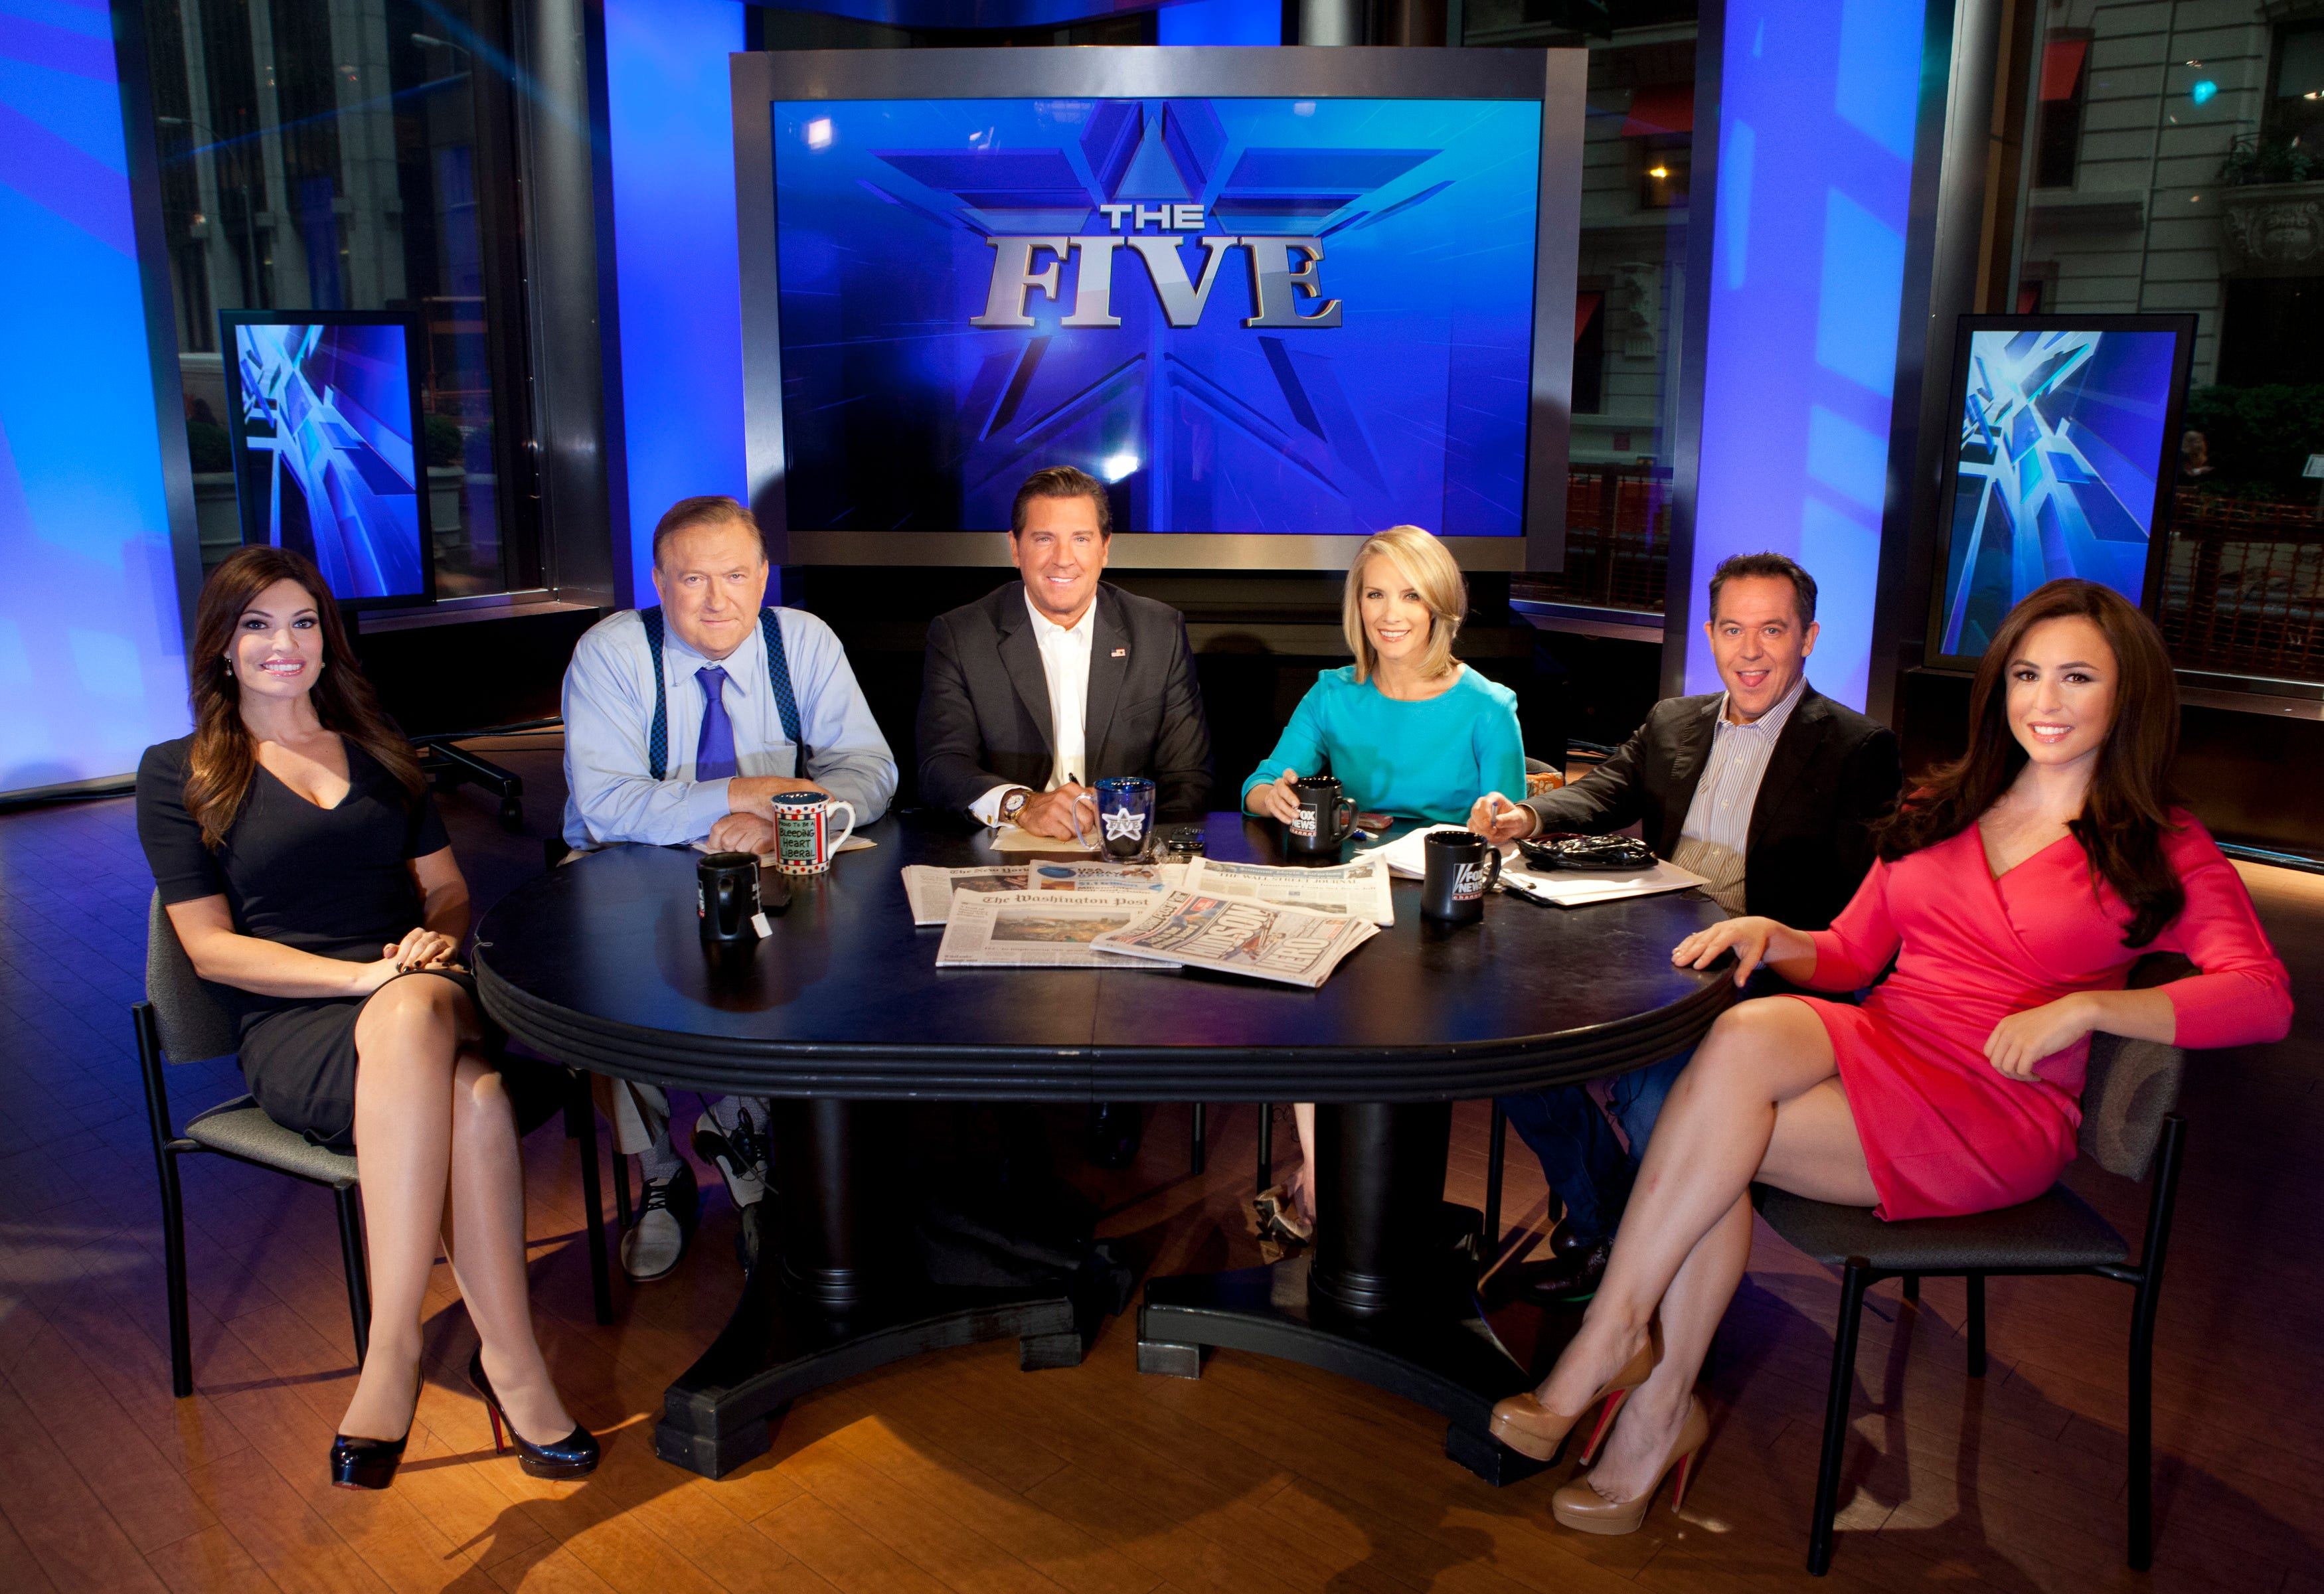 Dismissed dating show host